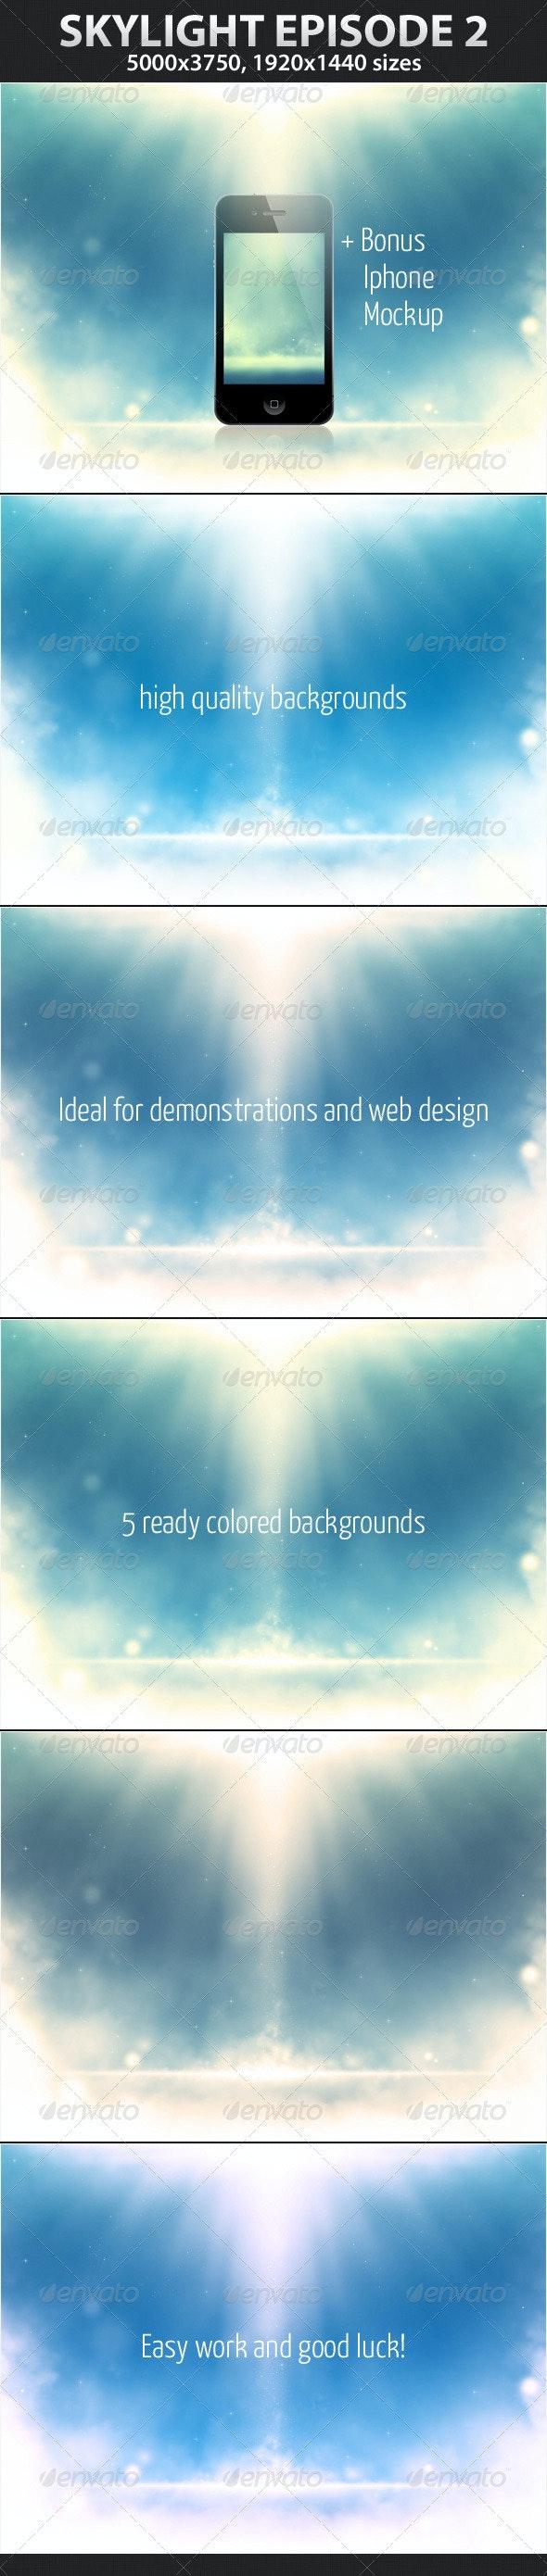 Skylight Episode 2 - Backgrounds Graphics